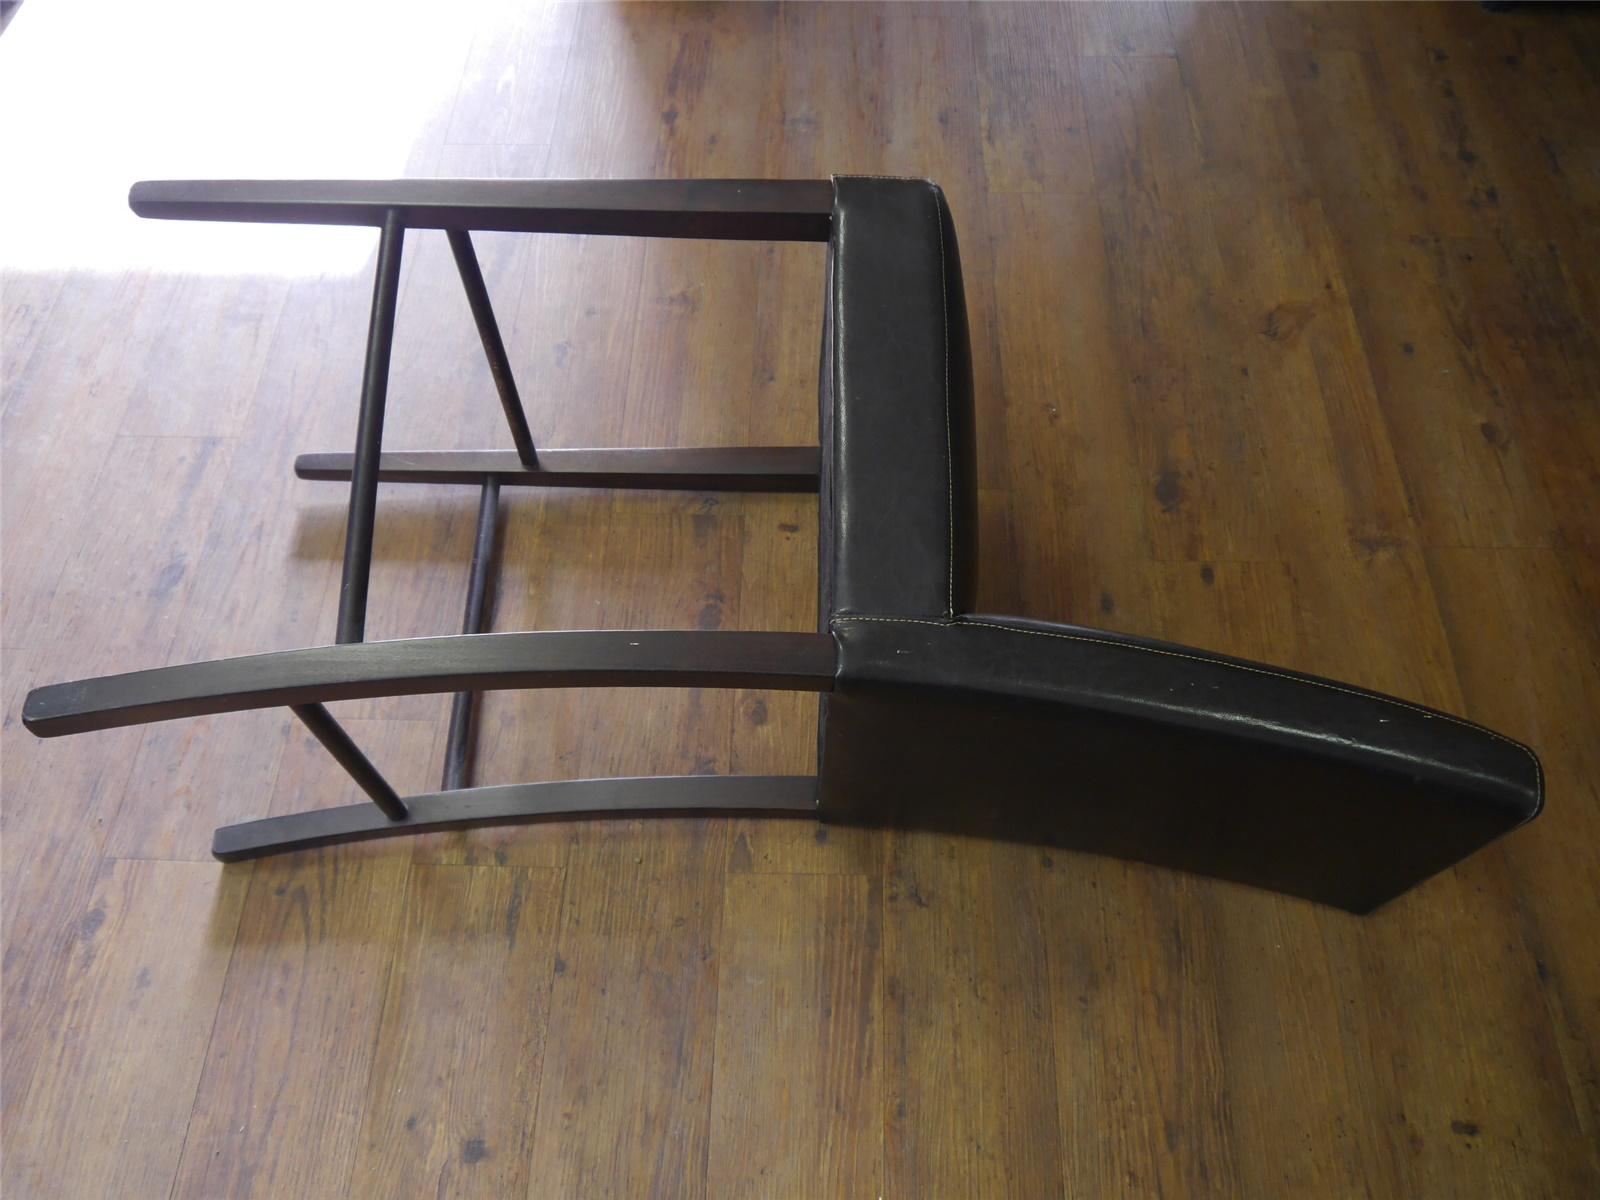 E234 Barhocker Barstuhl mit Rückenlehne / Kunstleder dunkelbraun / Nur Abholer